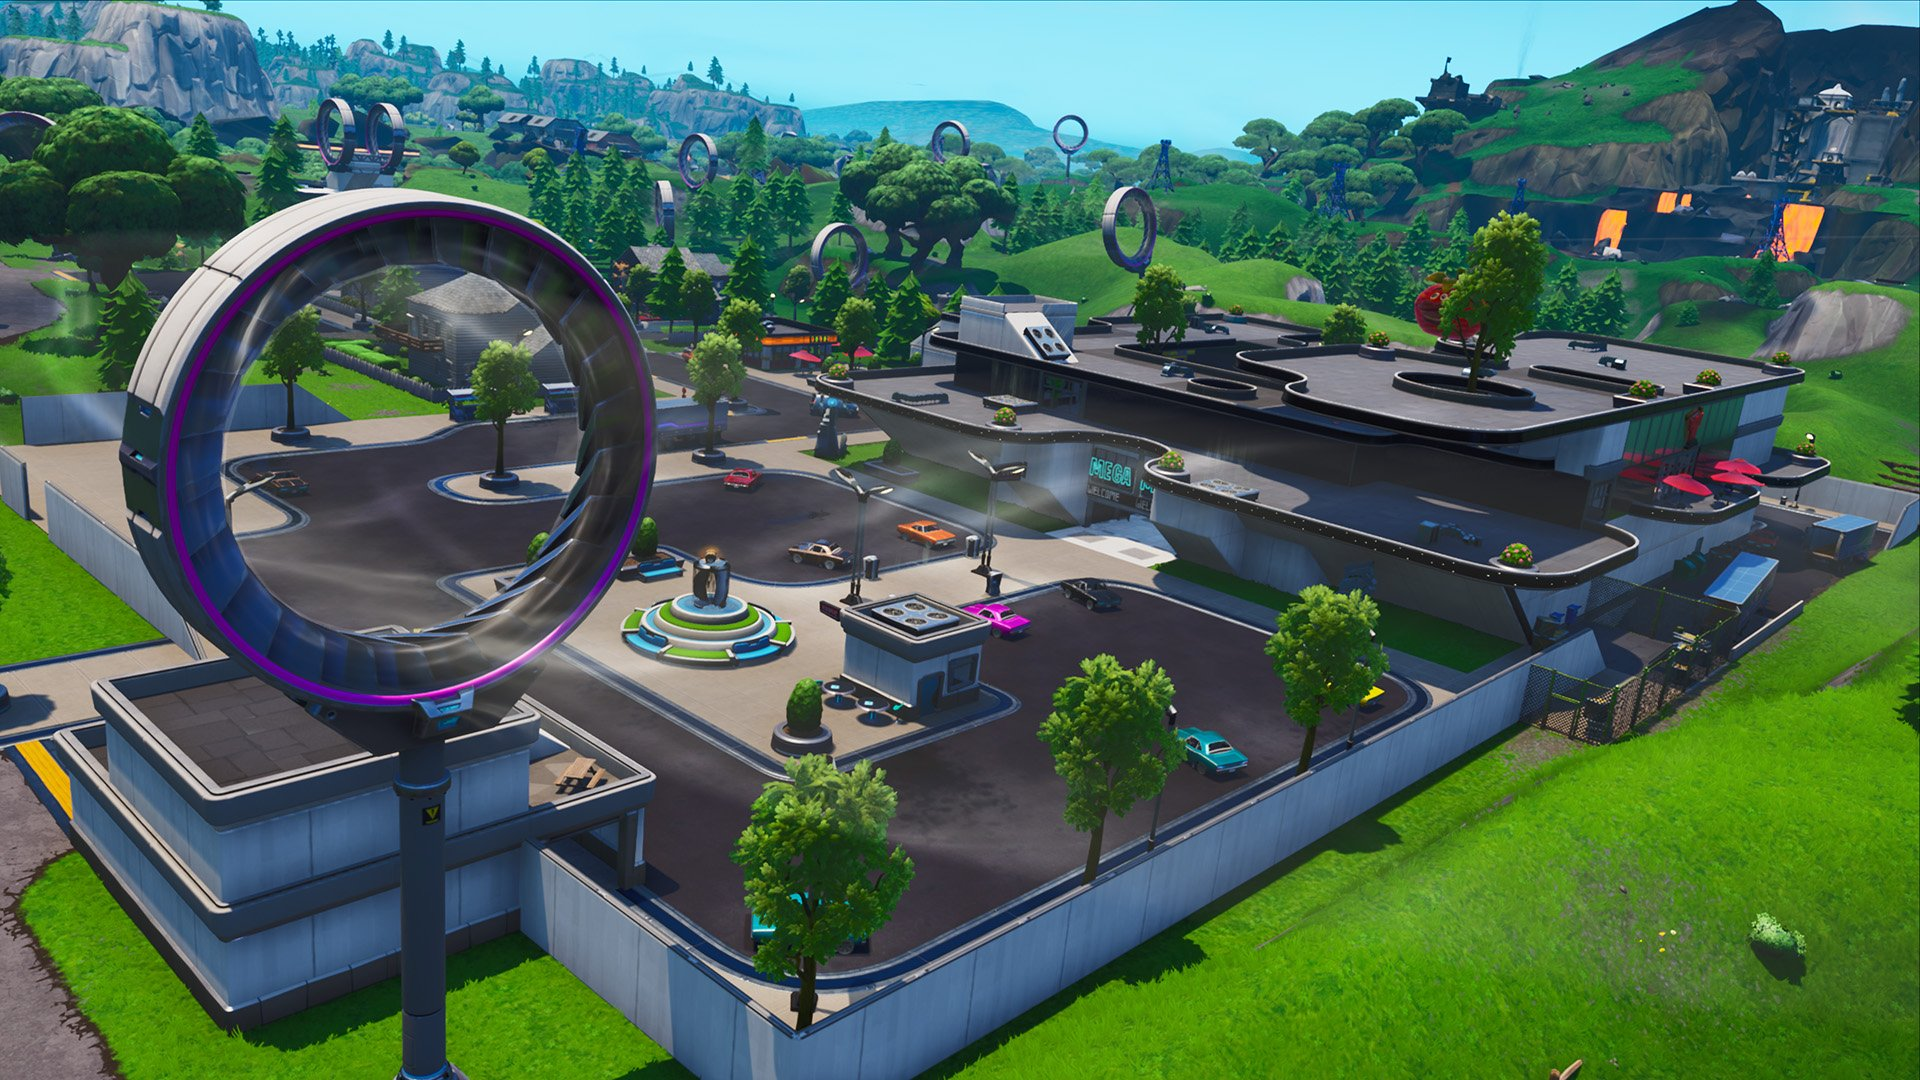 Fortnite Season 9 map changes - Mega Mall